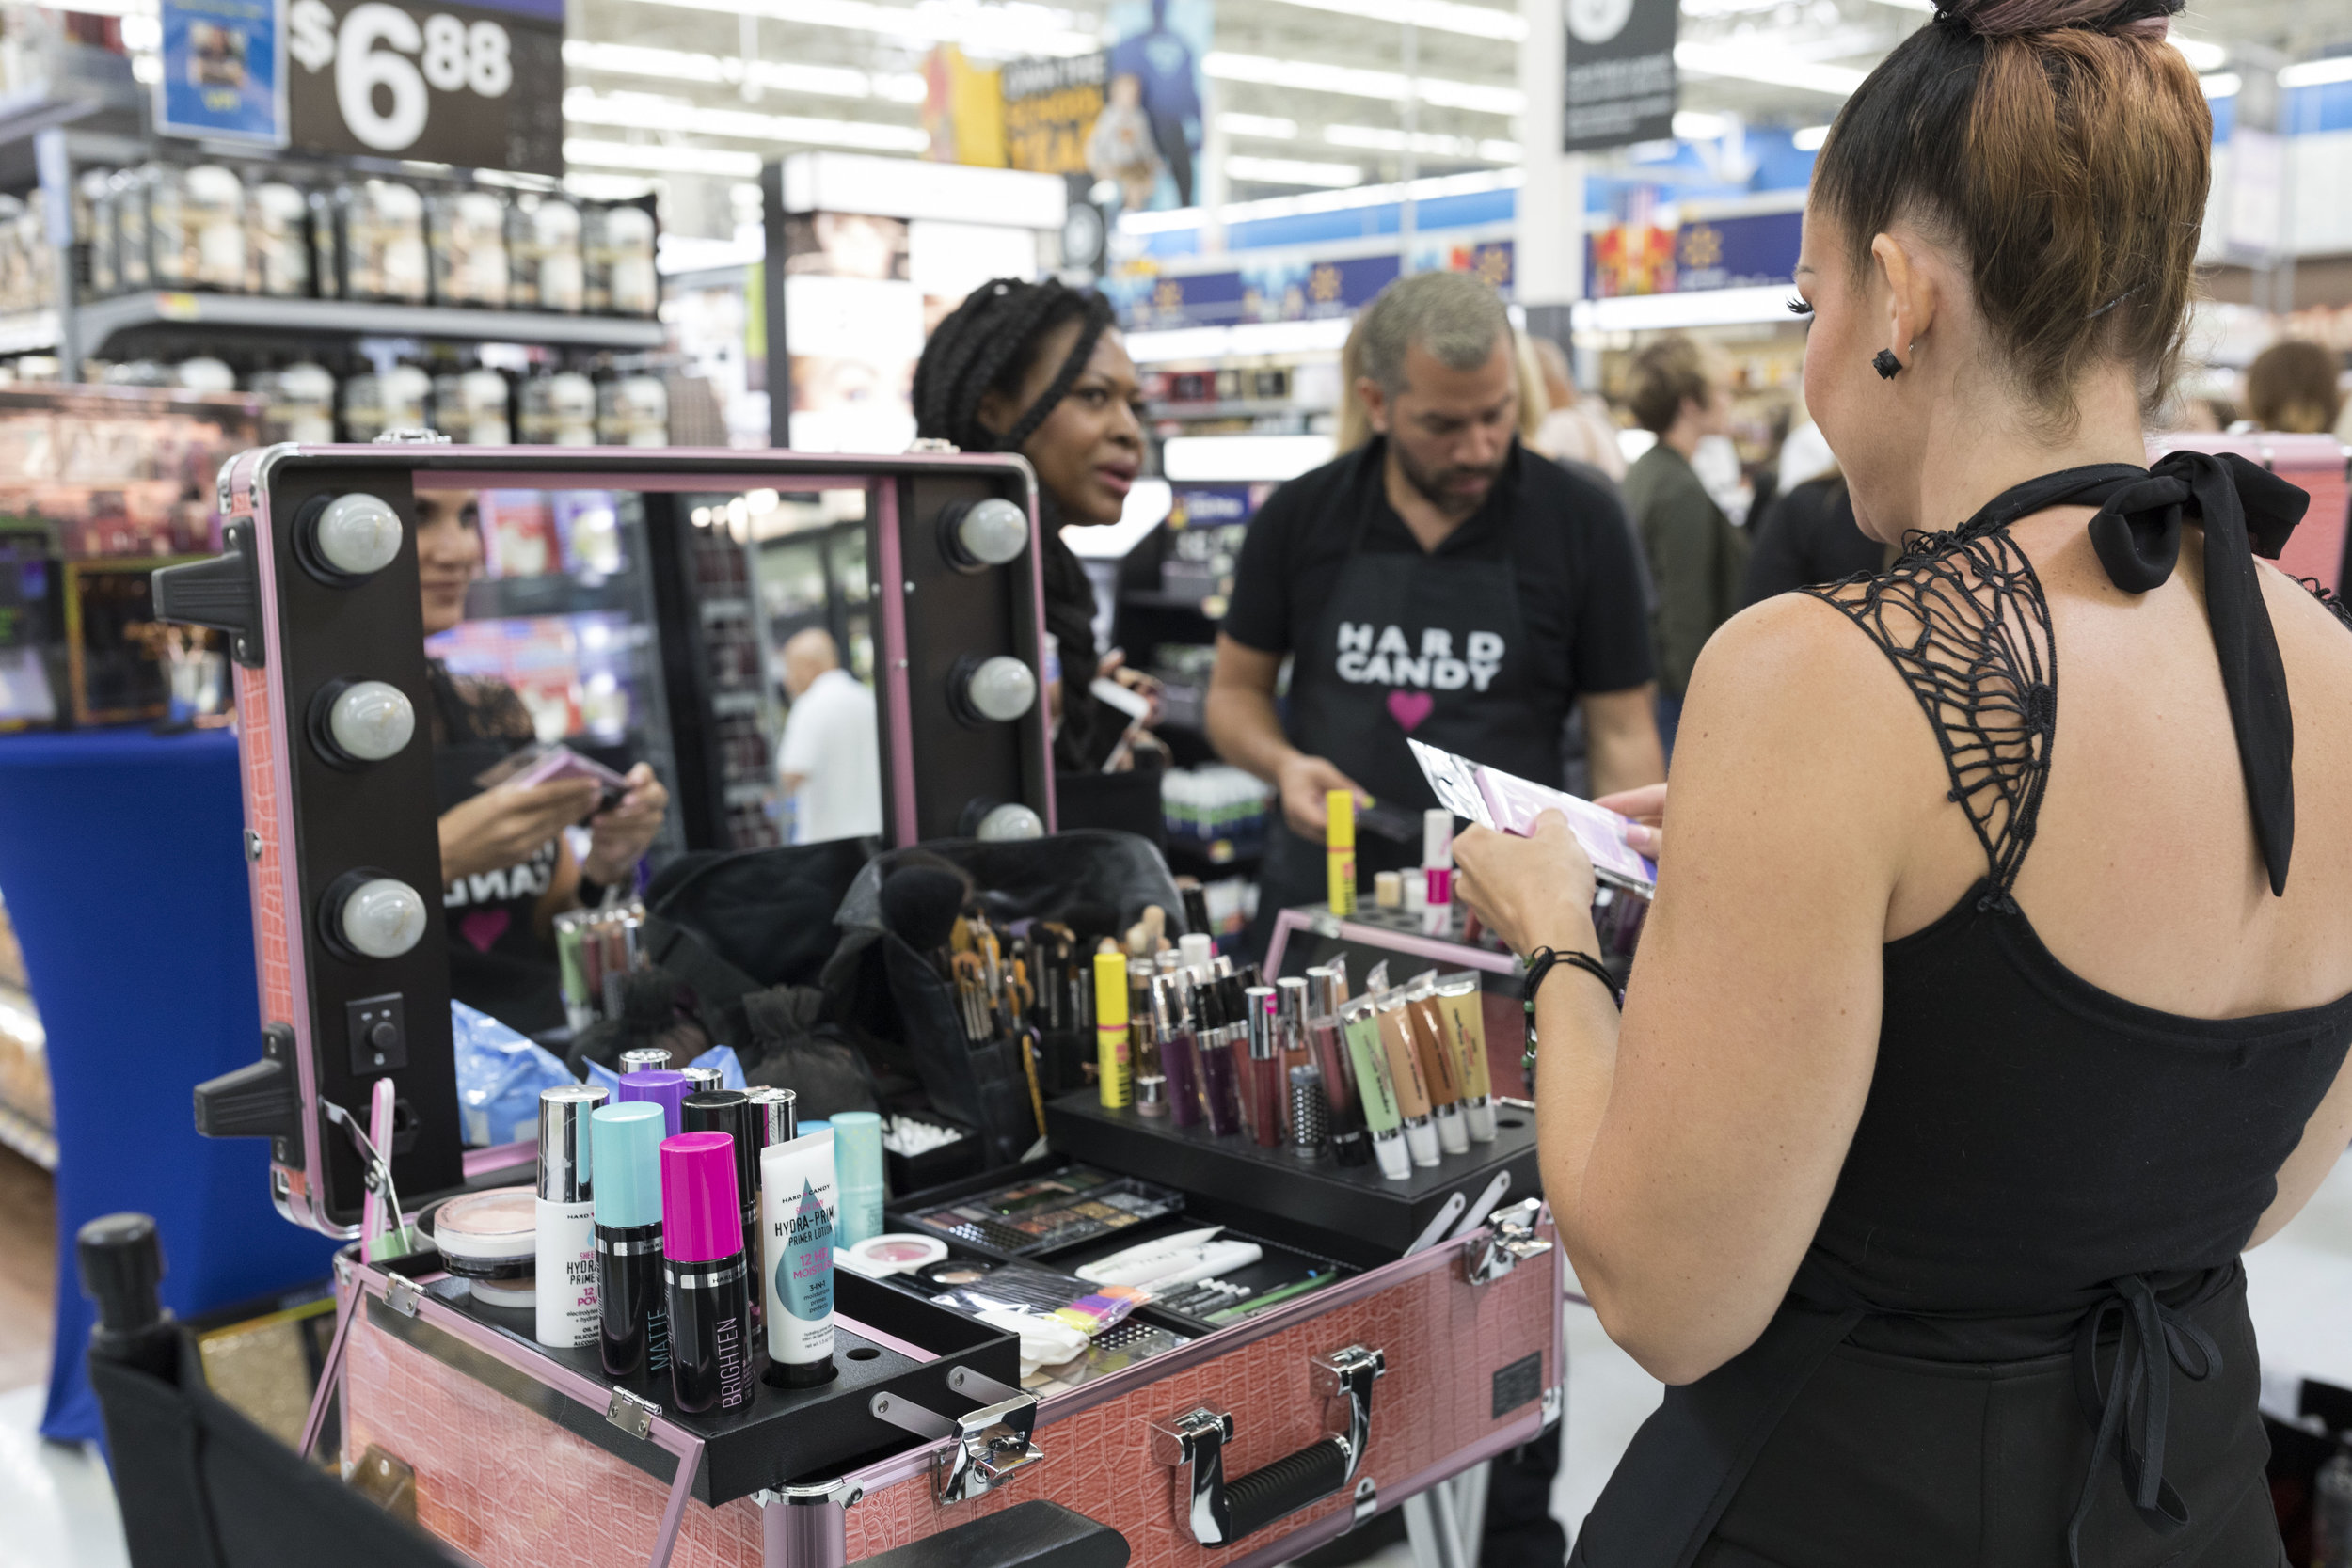 Walmart Fall Beauty Preview x Krity S